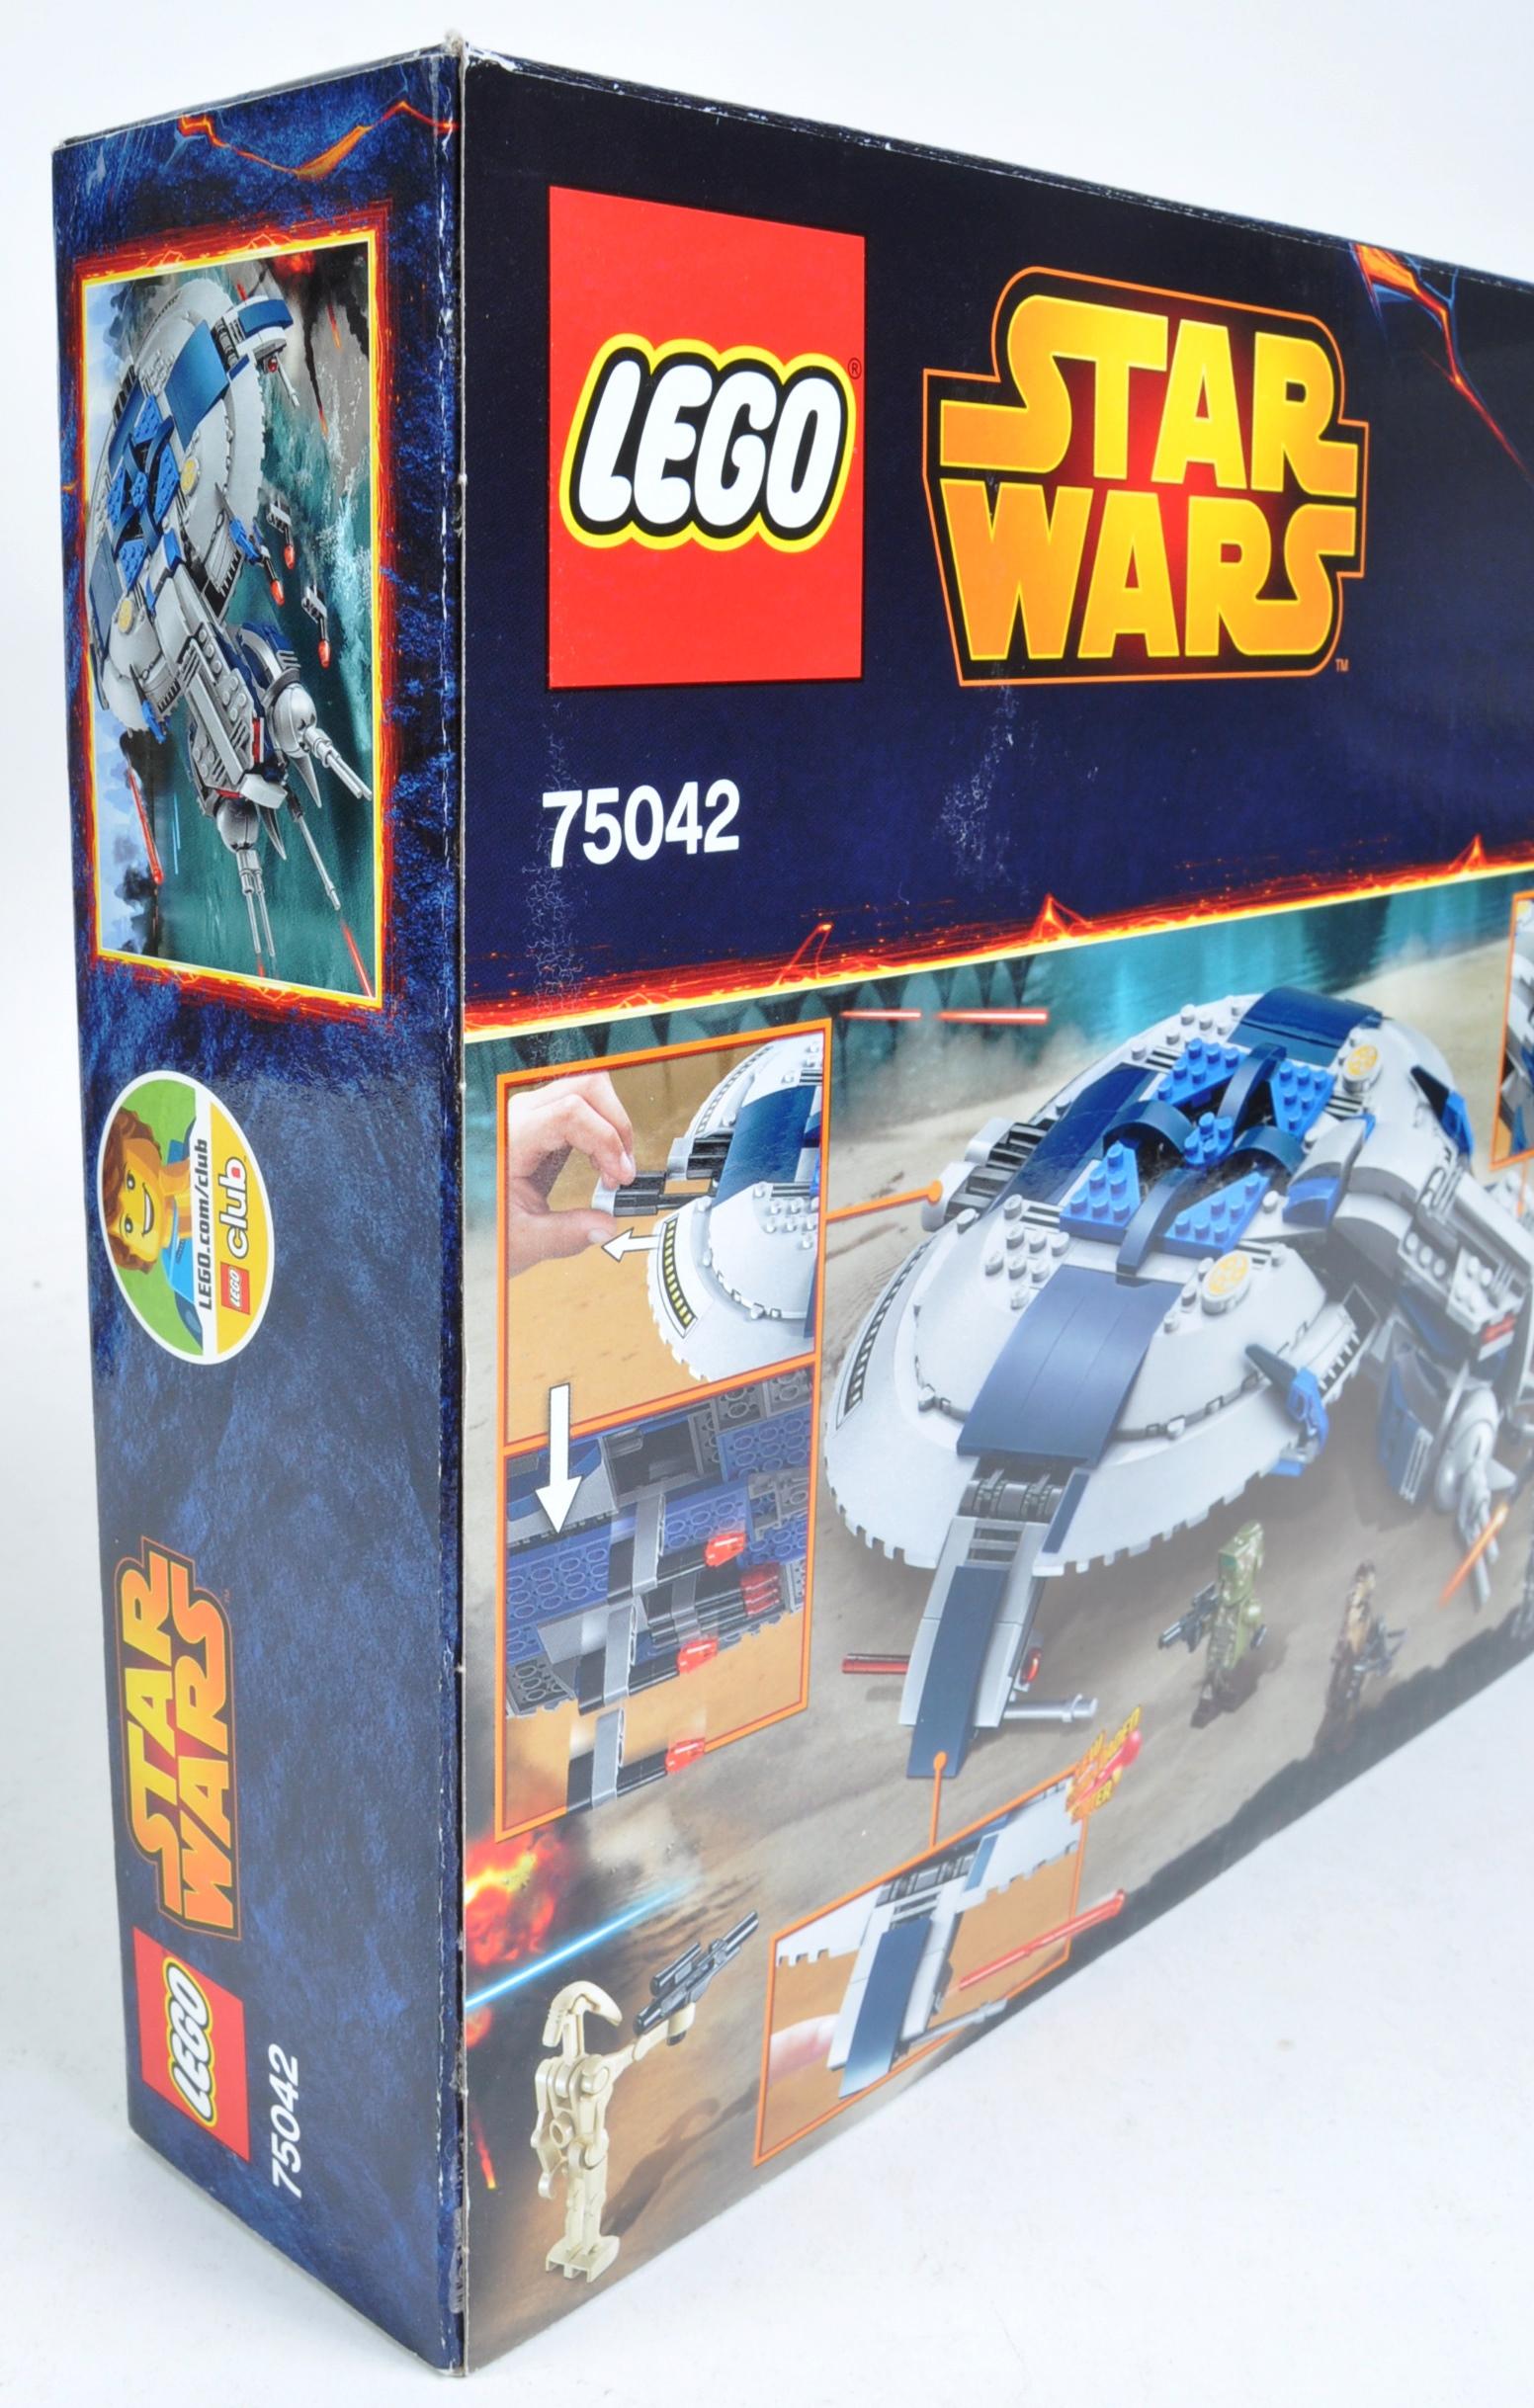 LEGO SETS - LEGO STAR WARS - 75041 / 75042 - Image 4 of 6